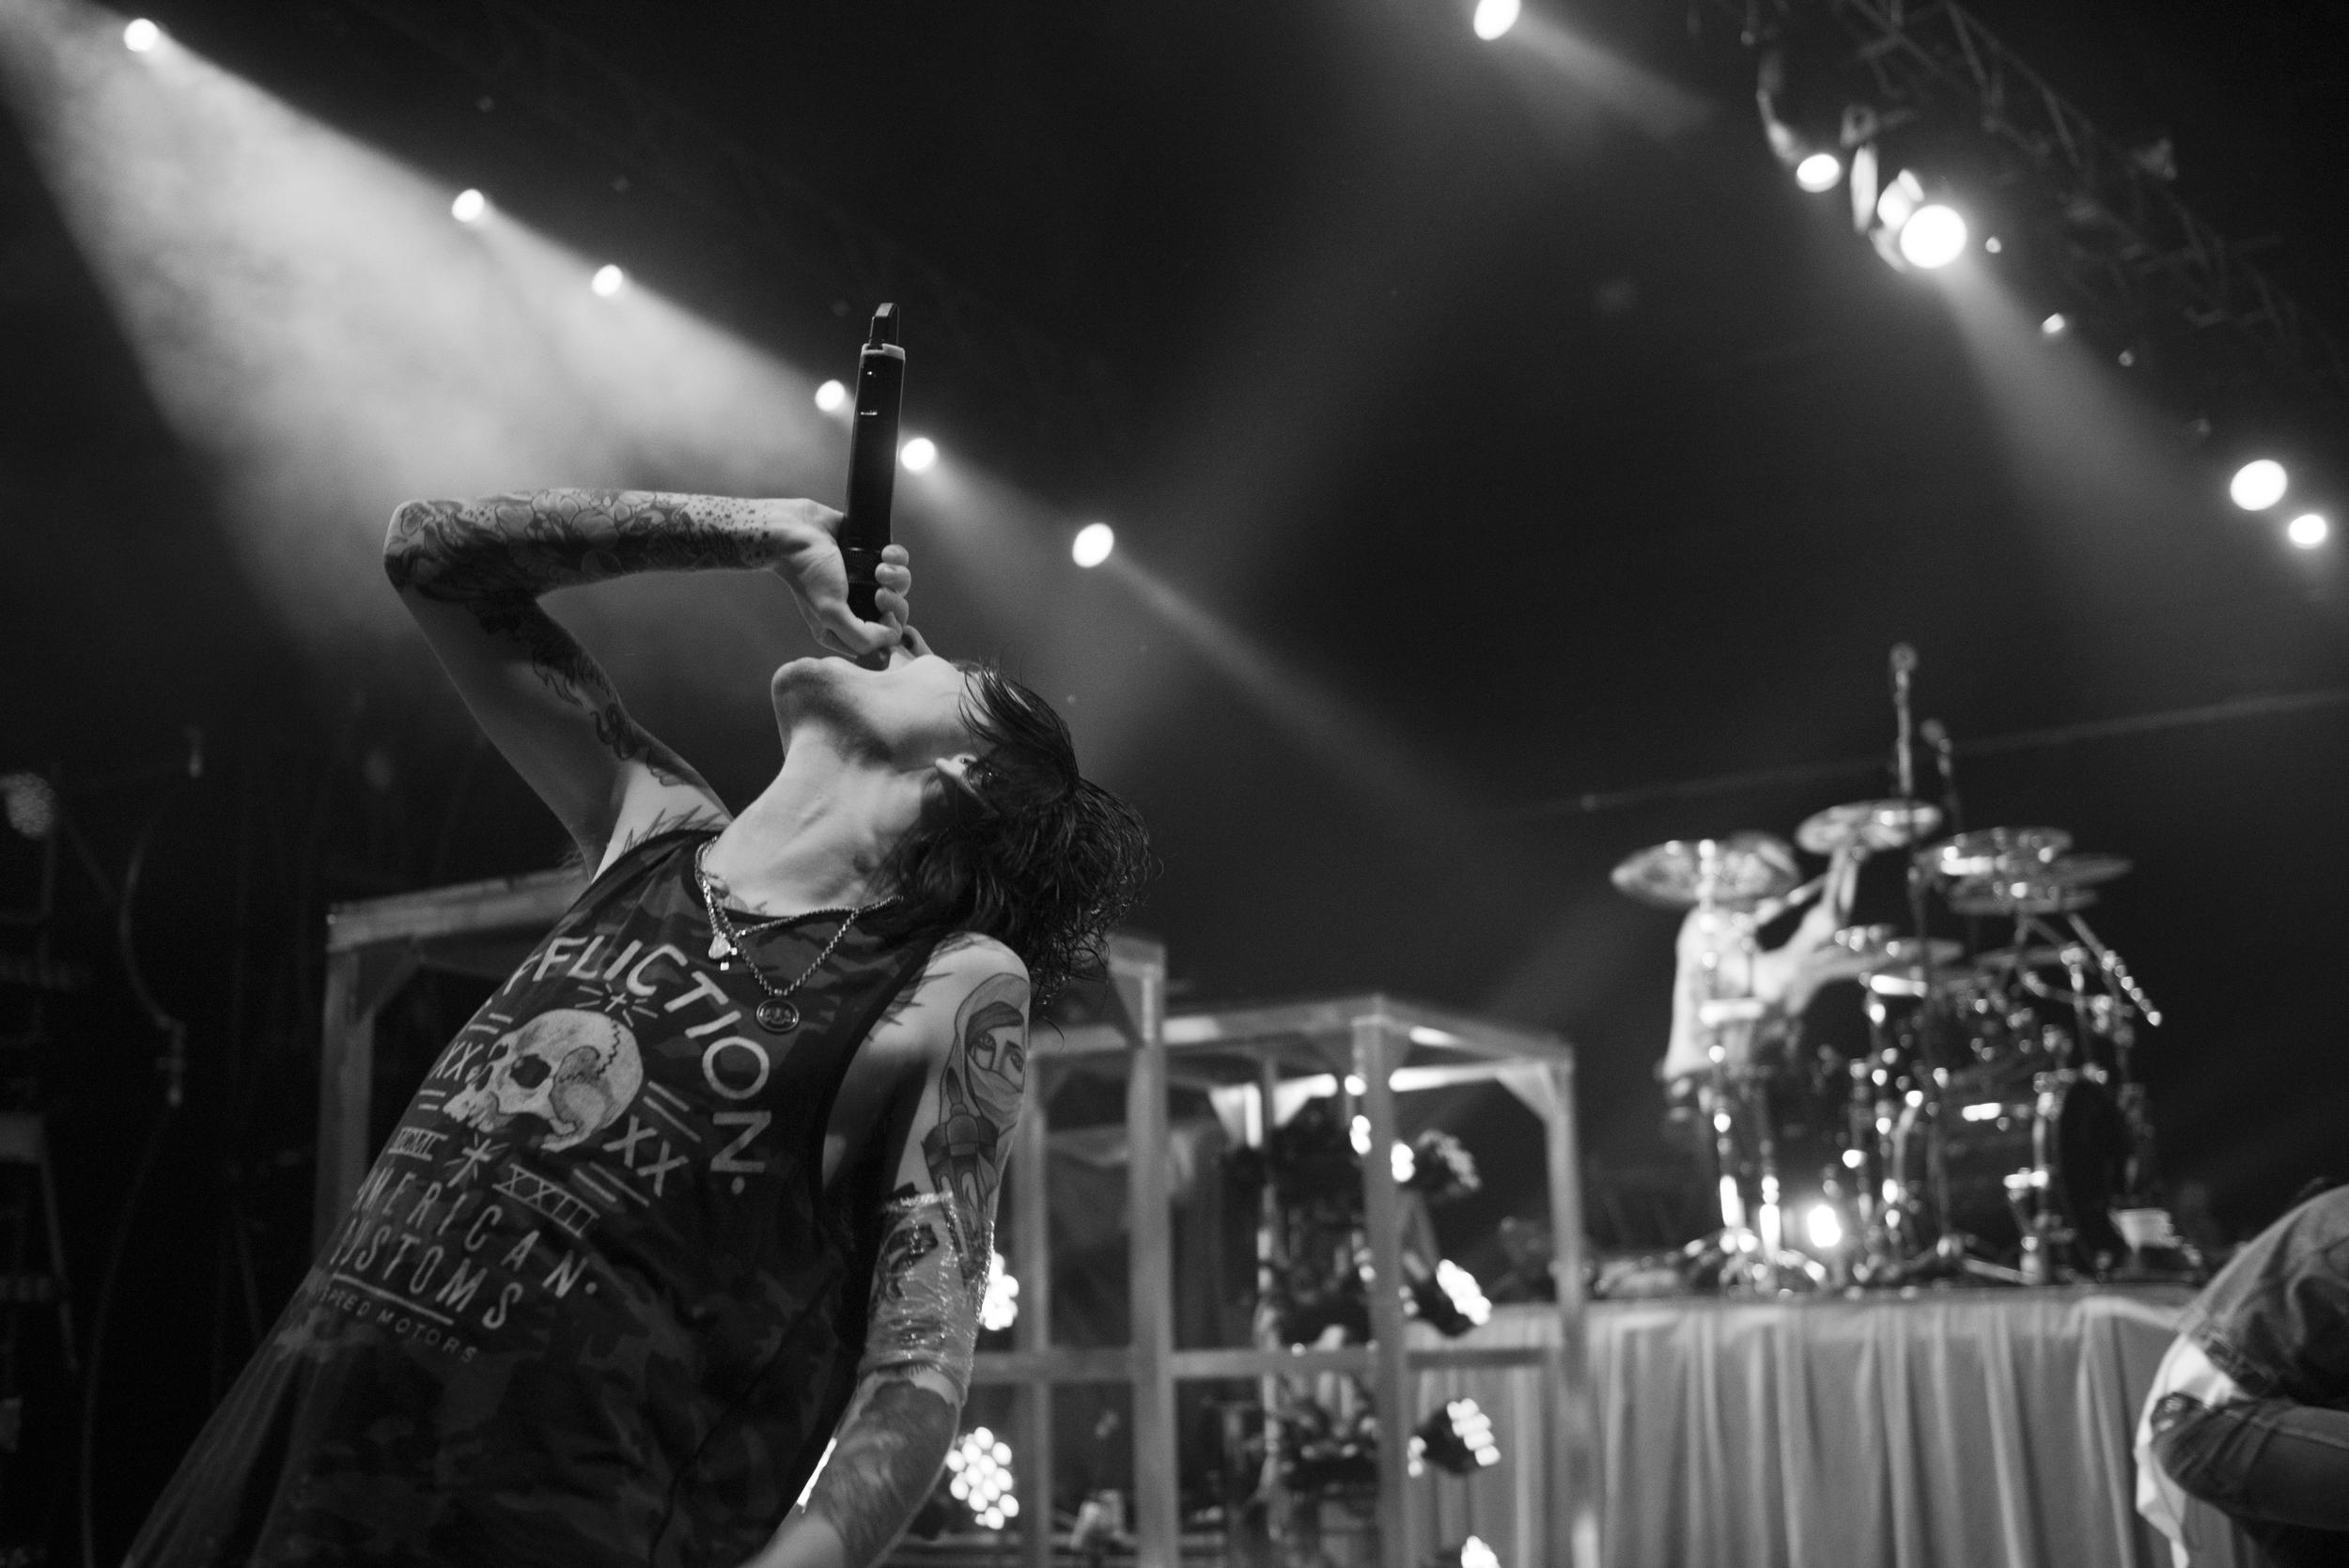 Denis Stoff of Asking Alexandria performs at The Joint at Hard Rock Hotel & Casino in Las Vegas Saturday, Feb. 6, 2016. Photo by Jason Ogulnik